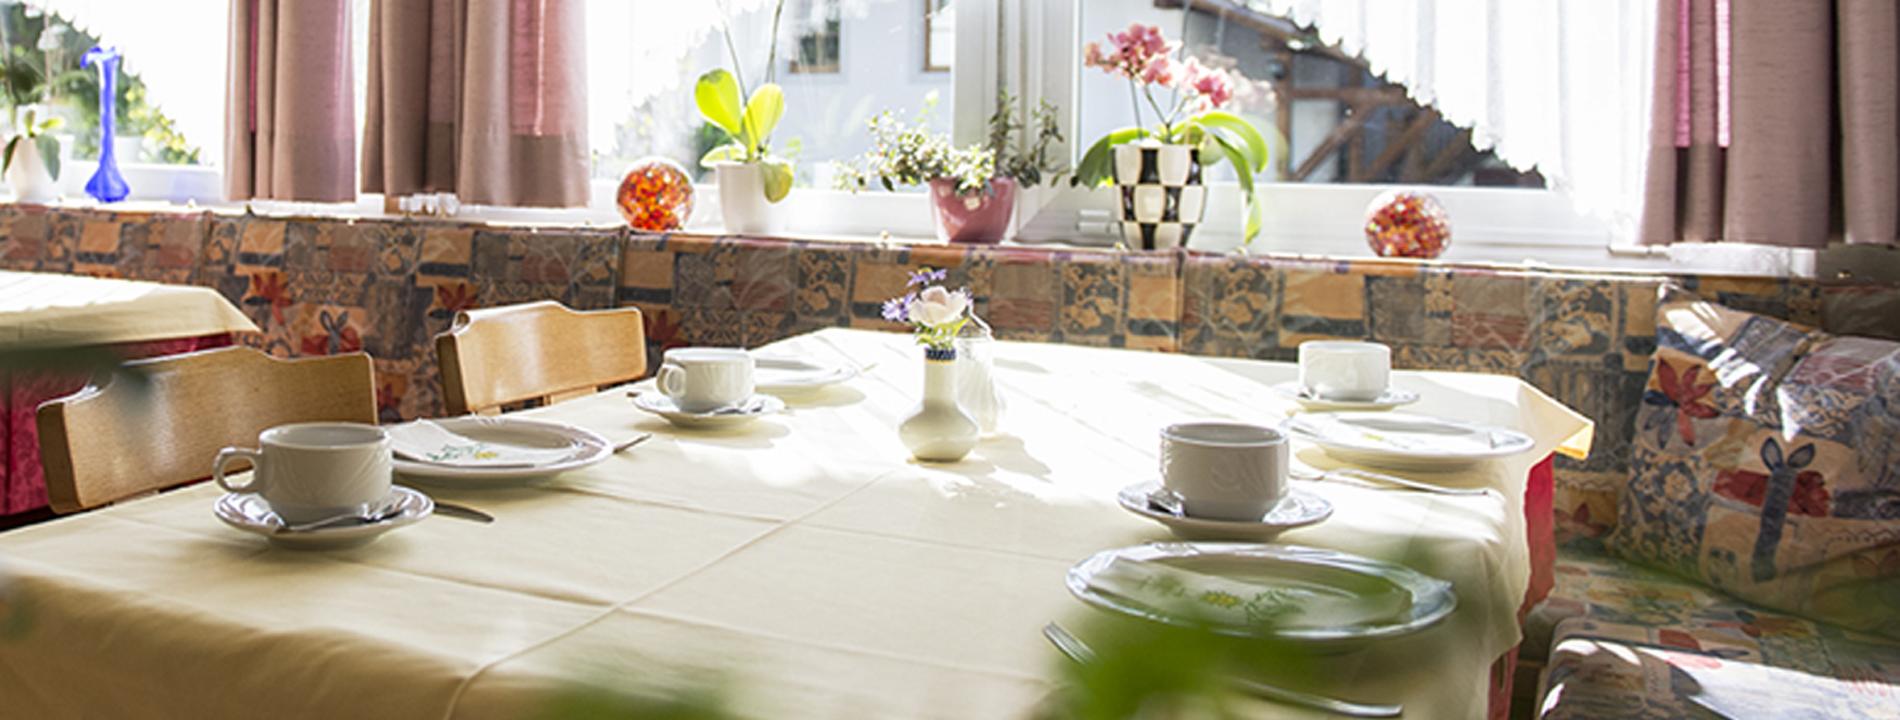 Frühstückspension-Sonnenberg